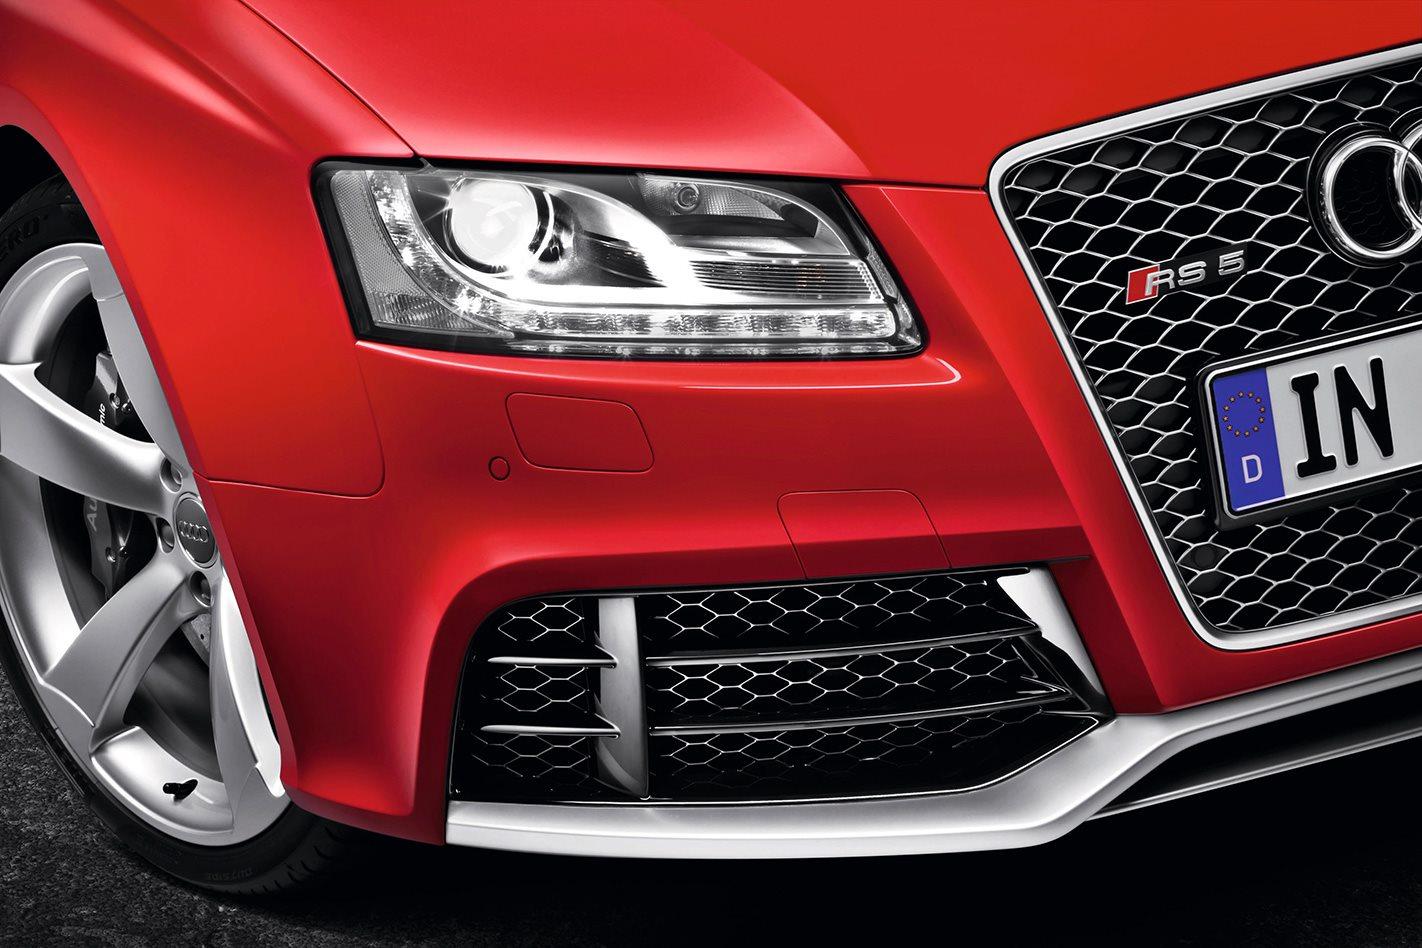 2010 Audi RS5 headlights